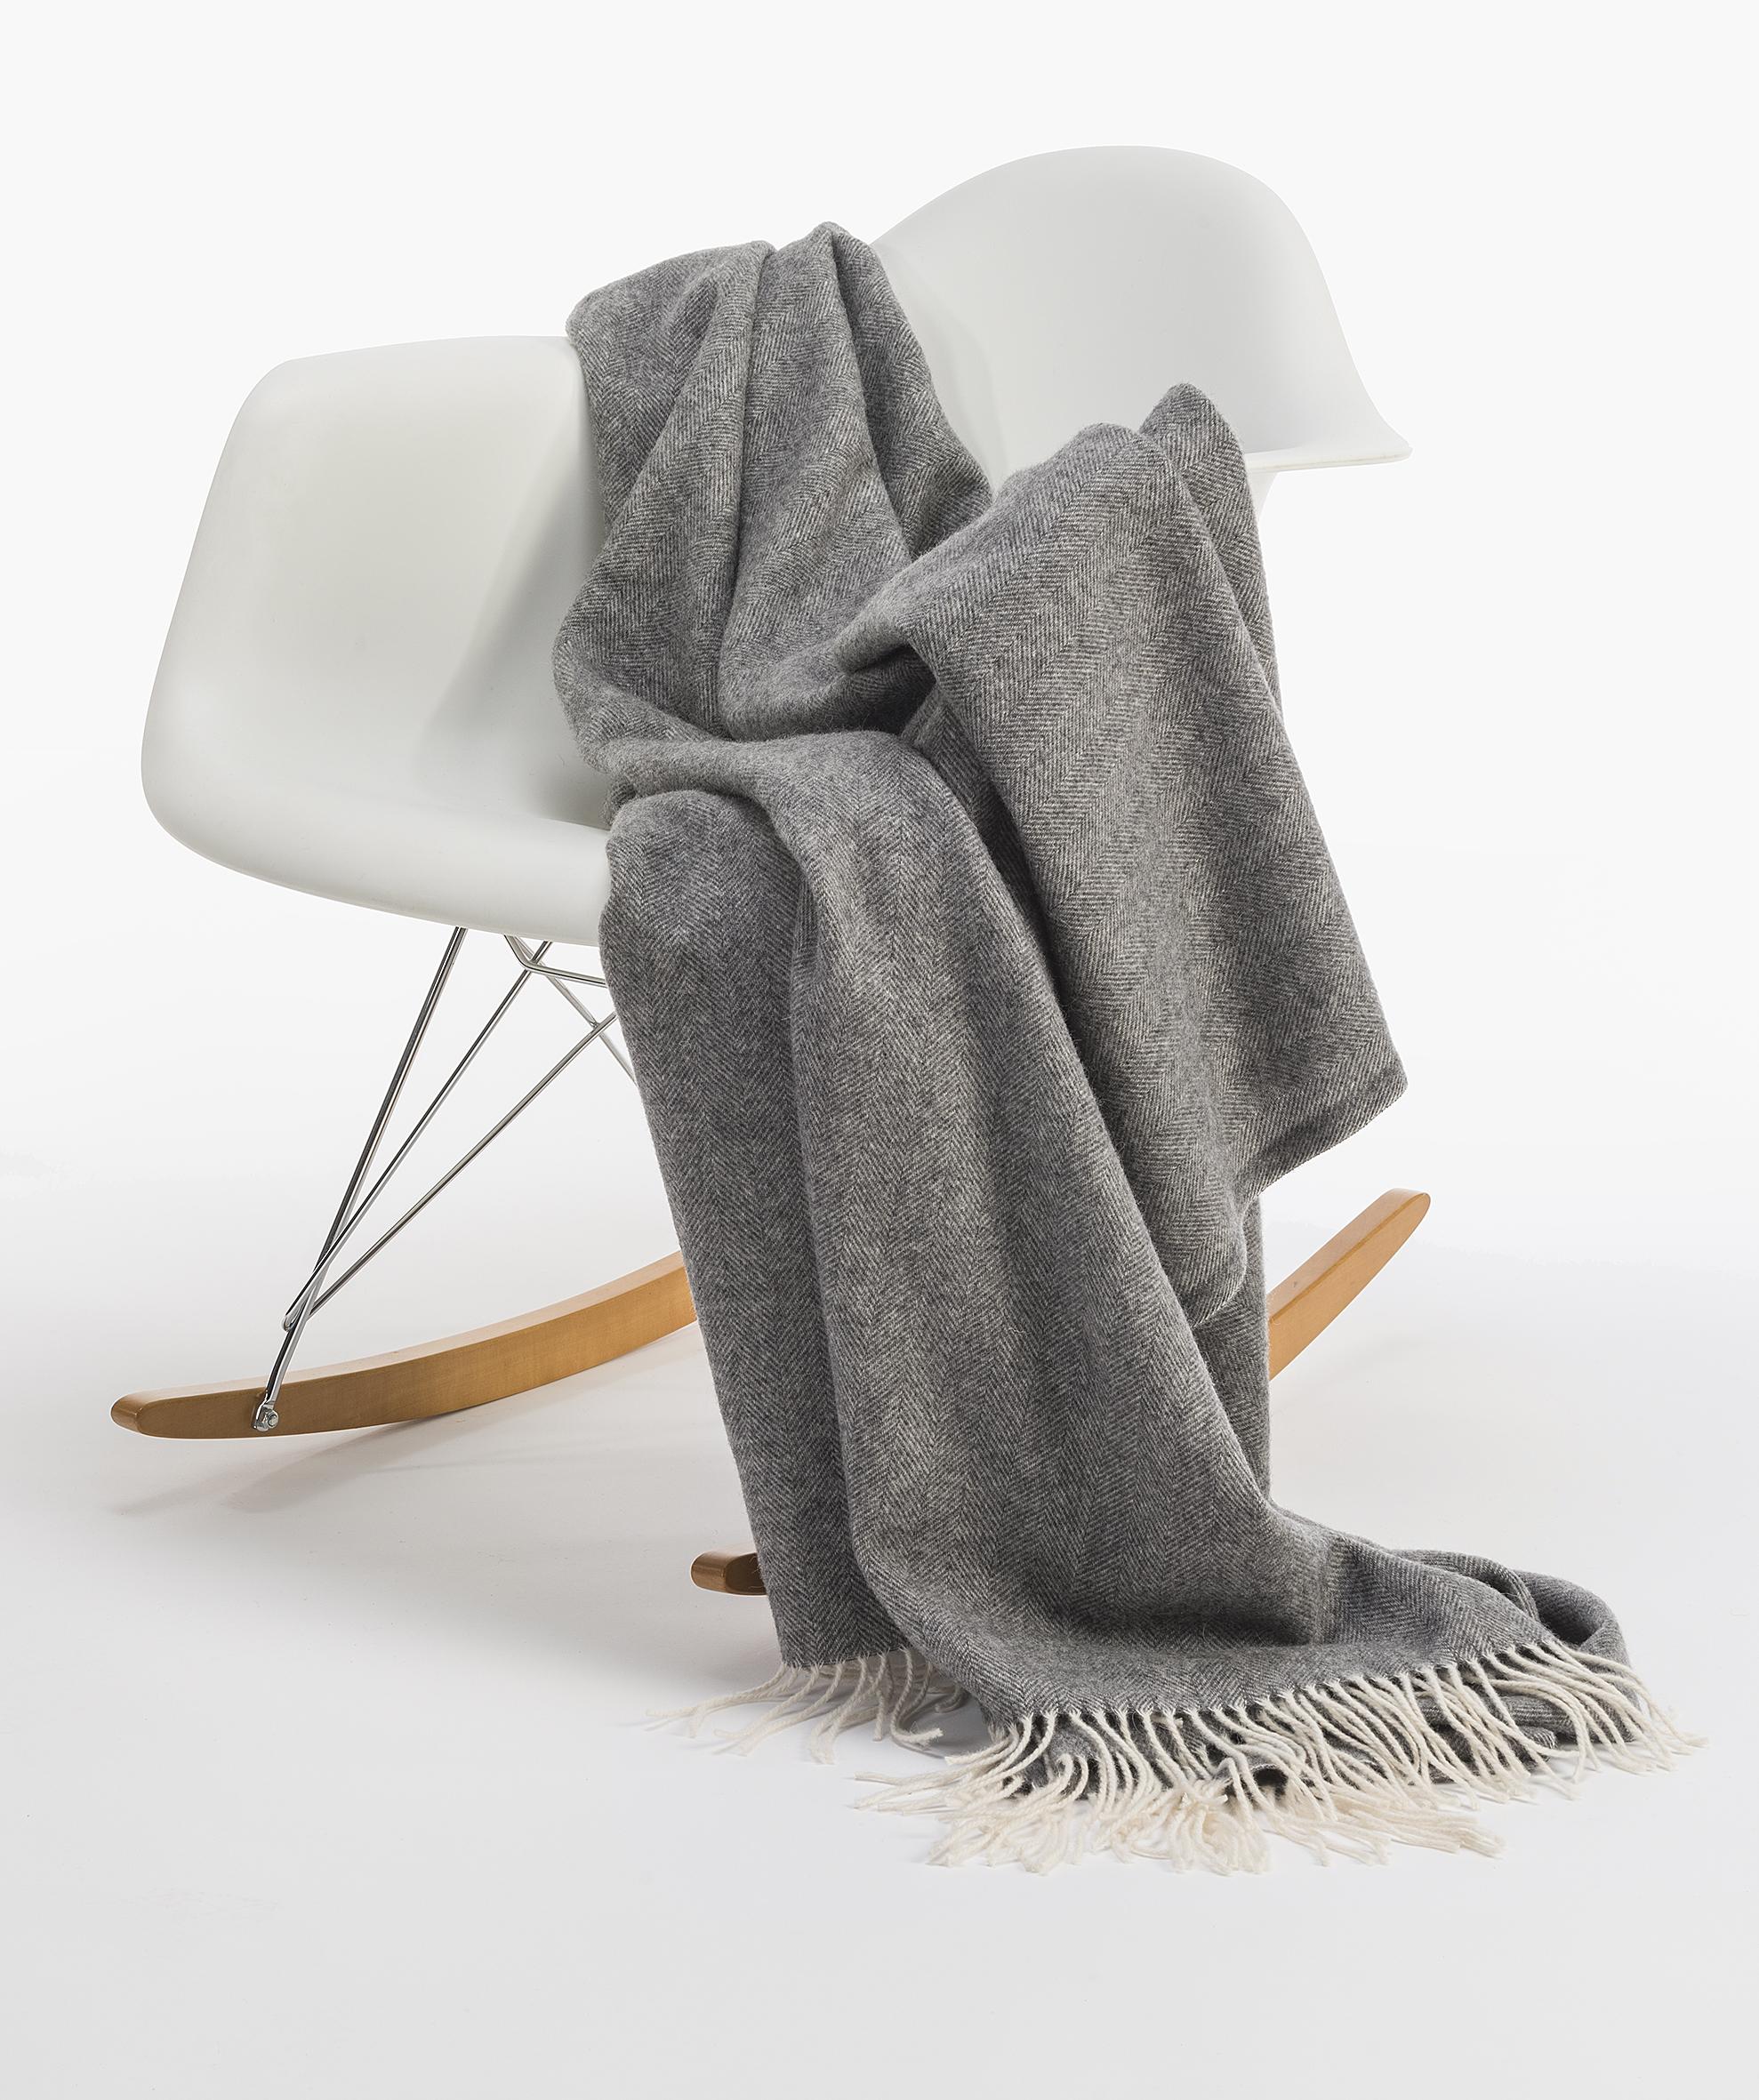 graue wolldecke affordable teilen sie ihre freude with graue wolldecke wolldecke ruana gelb. Black Bedroom Furniture Sets. Home Design Ideas